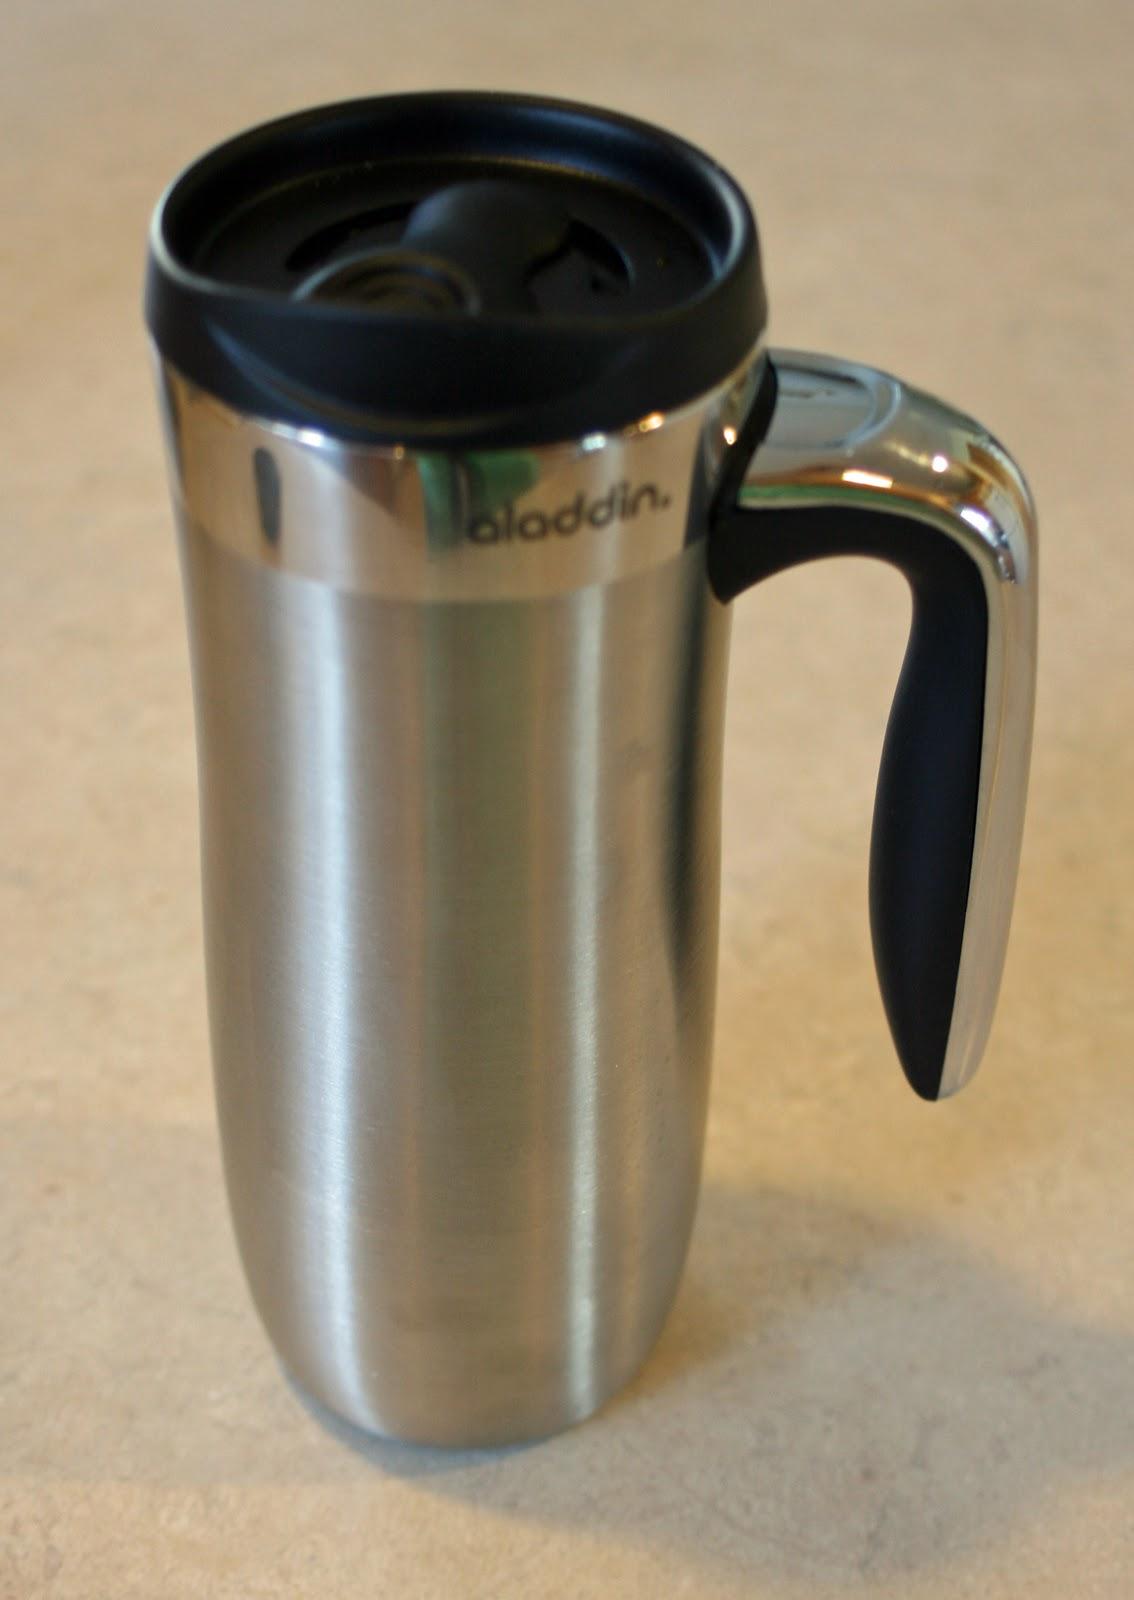 Amazon aladdin coffee mugs -  Aladdin Senja